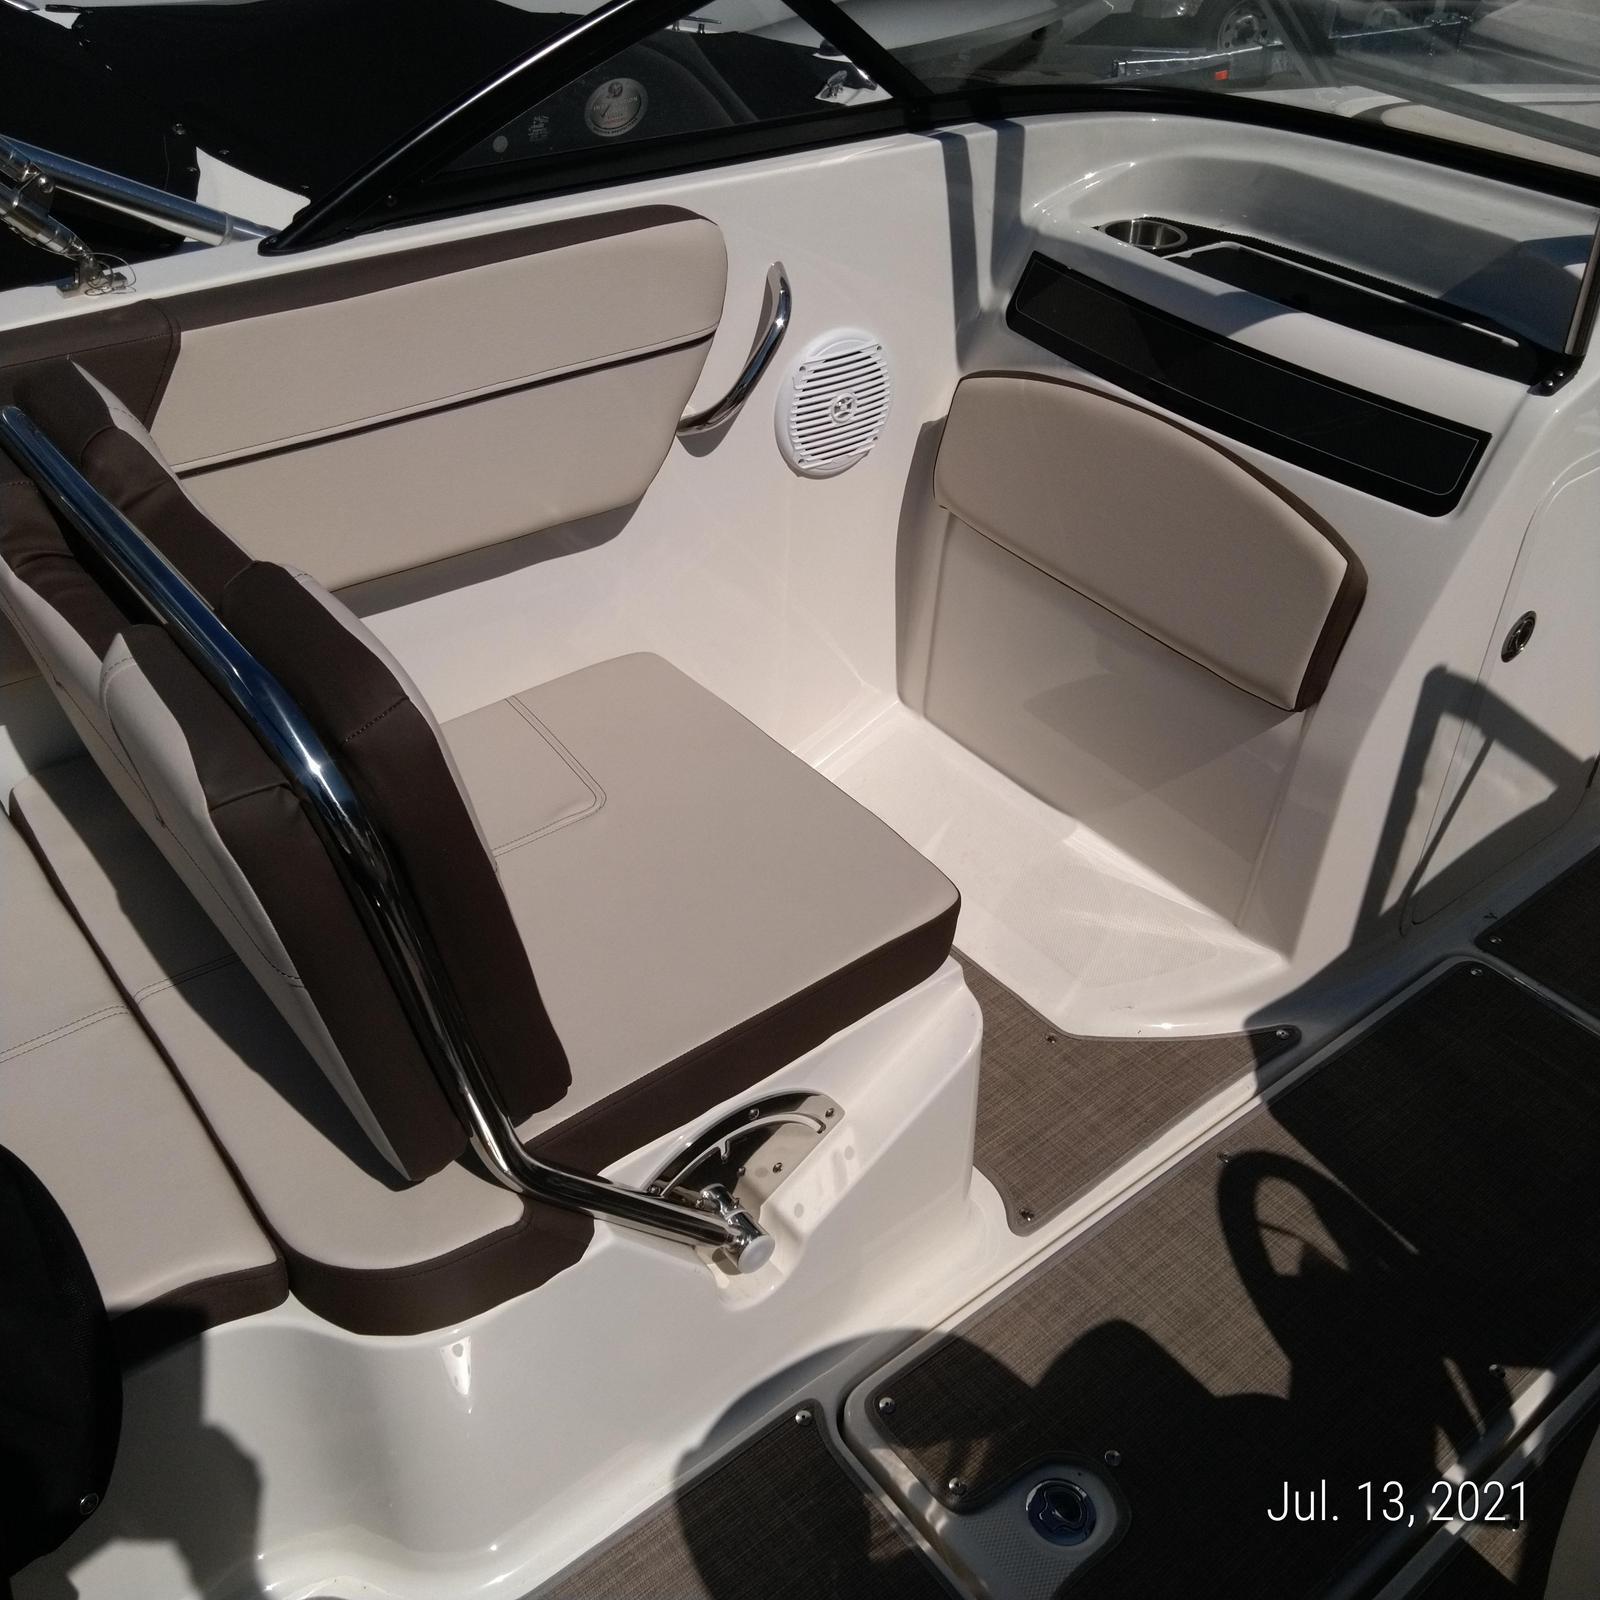 2018 Bayliner boat for sale, model of the boat is VR5 Bowrider & Image # 2 of 2